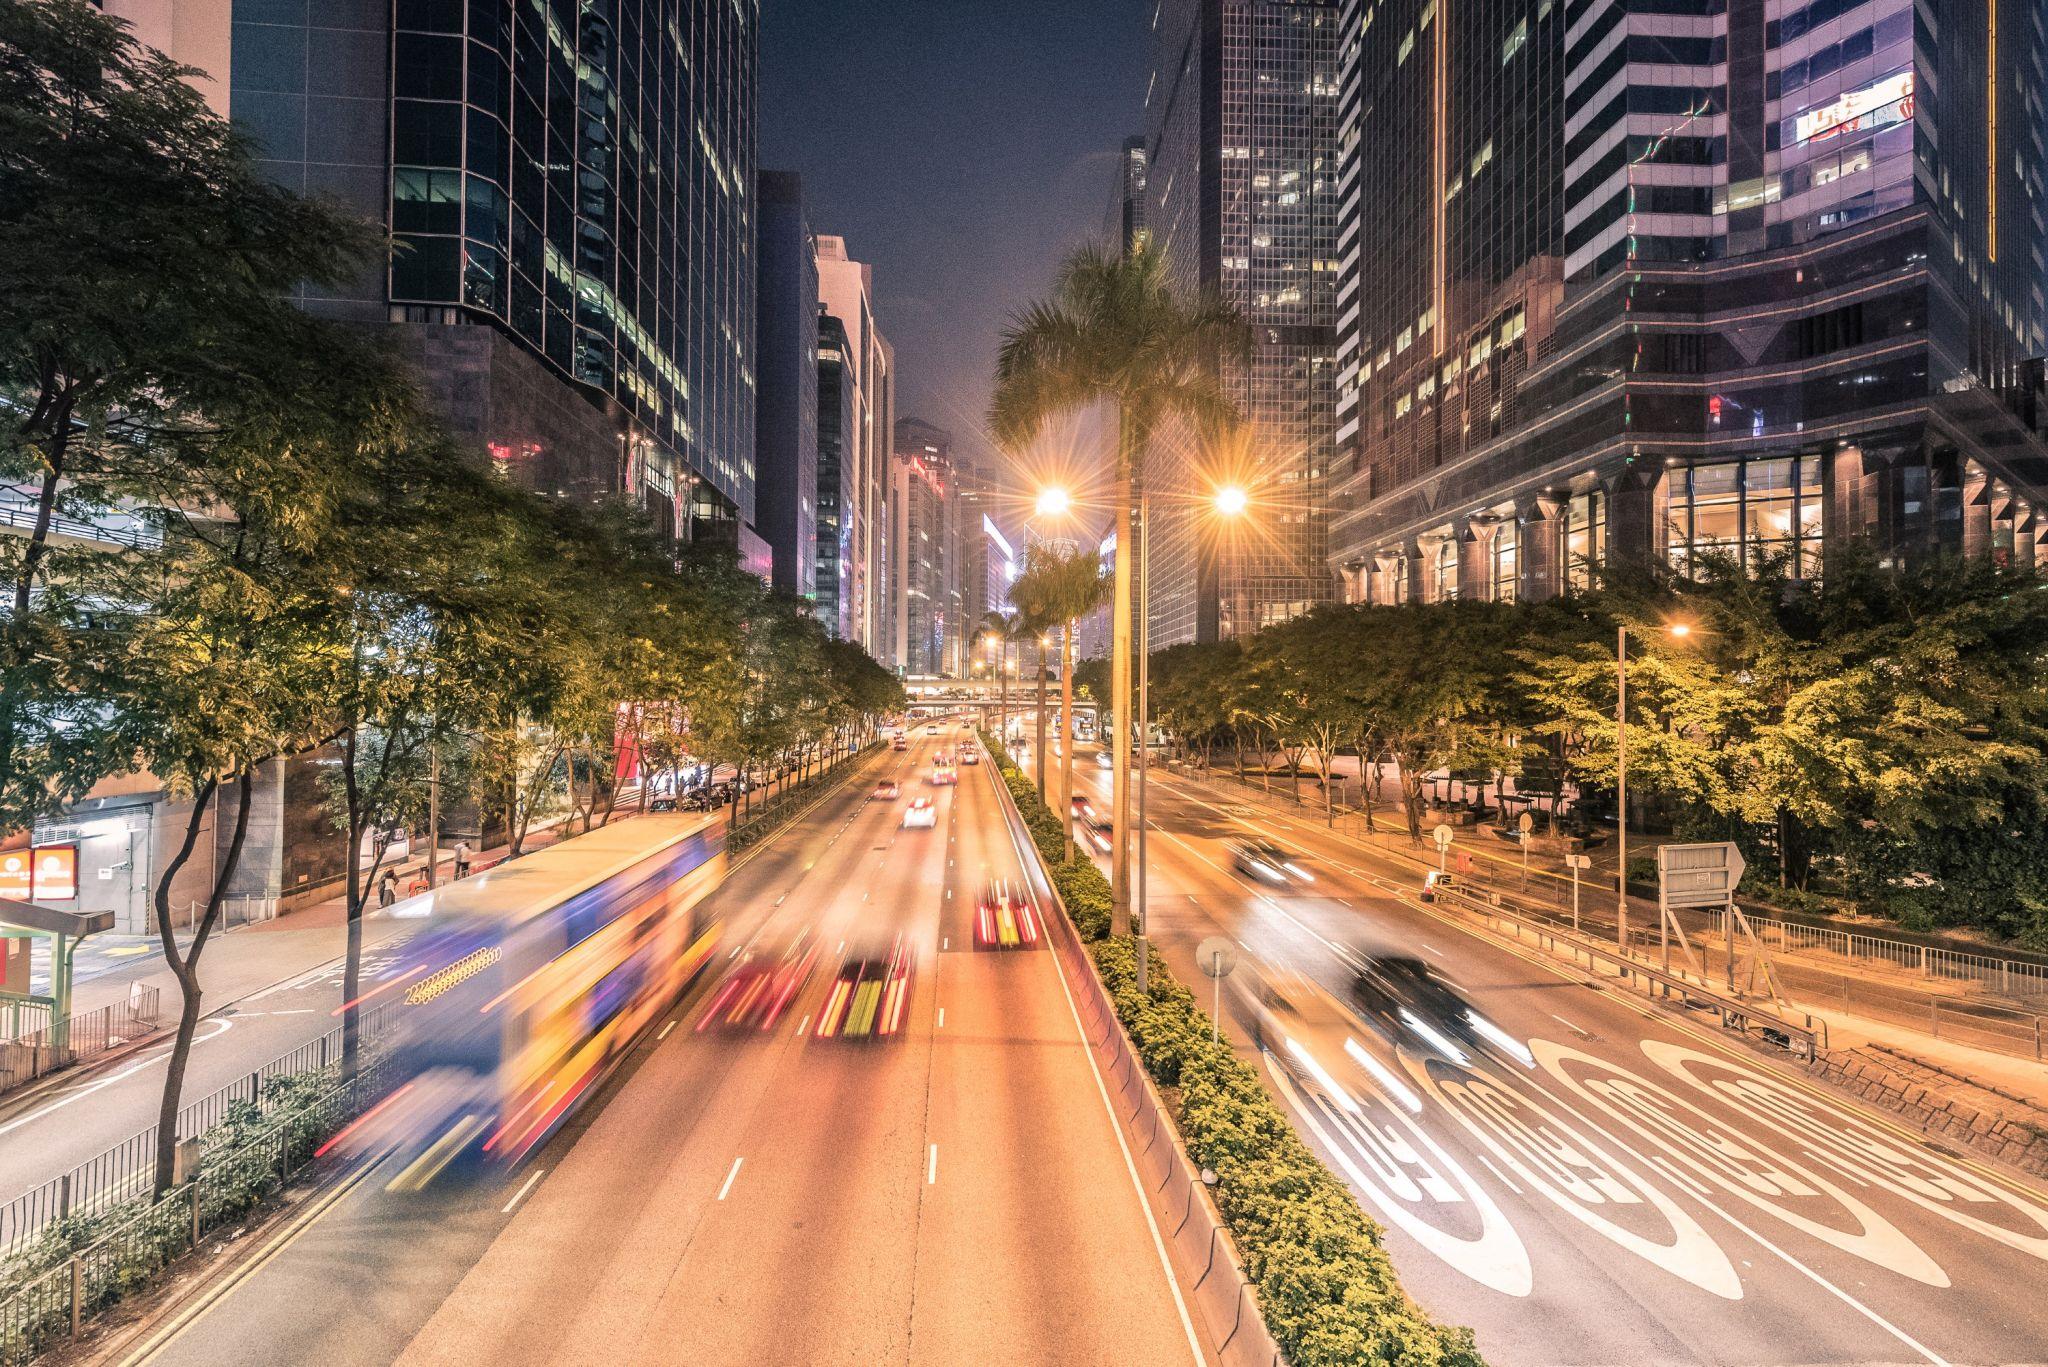 Nightfall in Hong Kong, Hong Kong